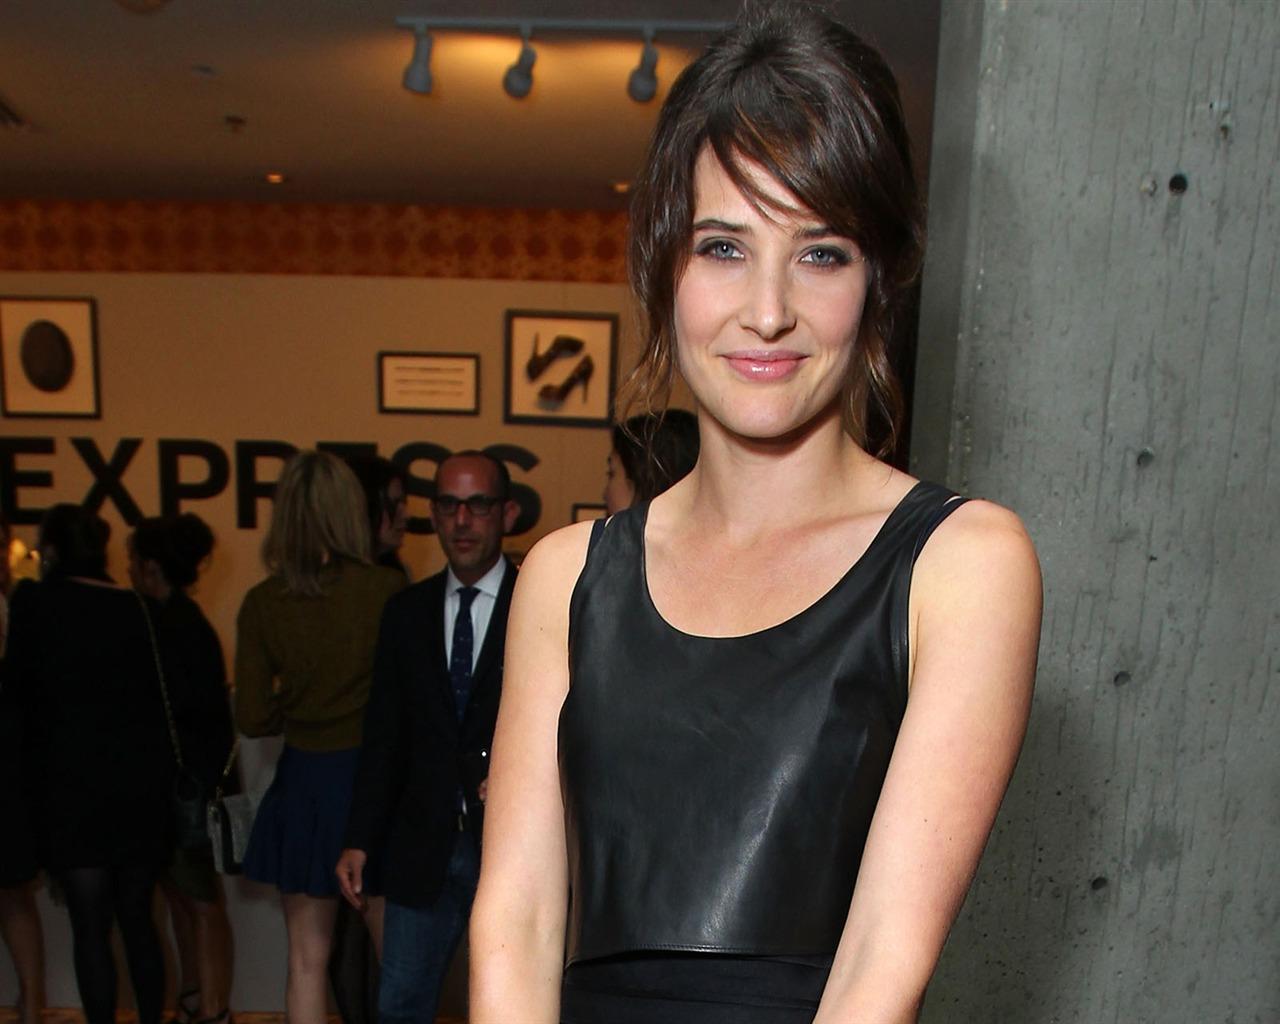 Actress cobie smulders cute stills